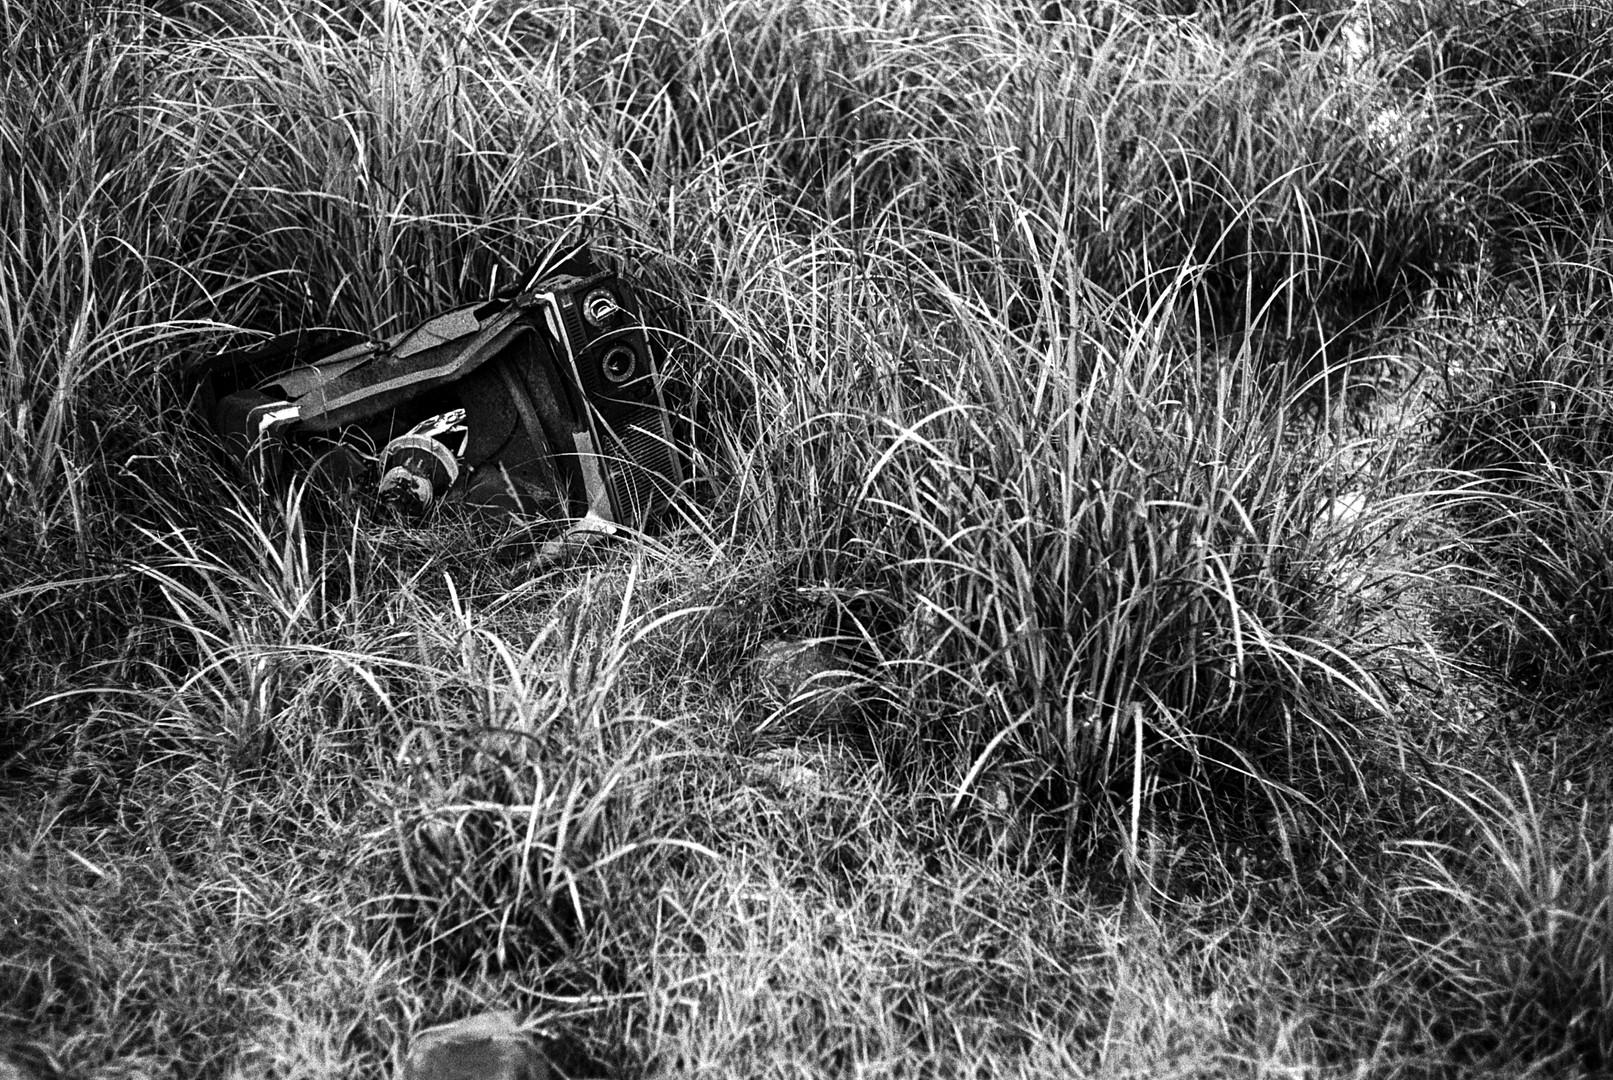 tv in the grasstif.jpg